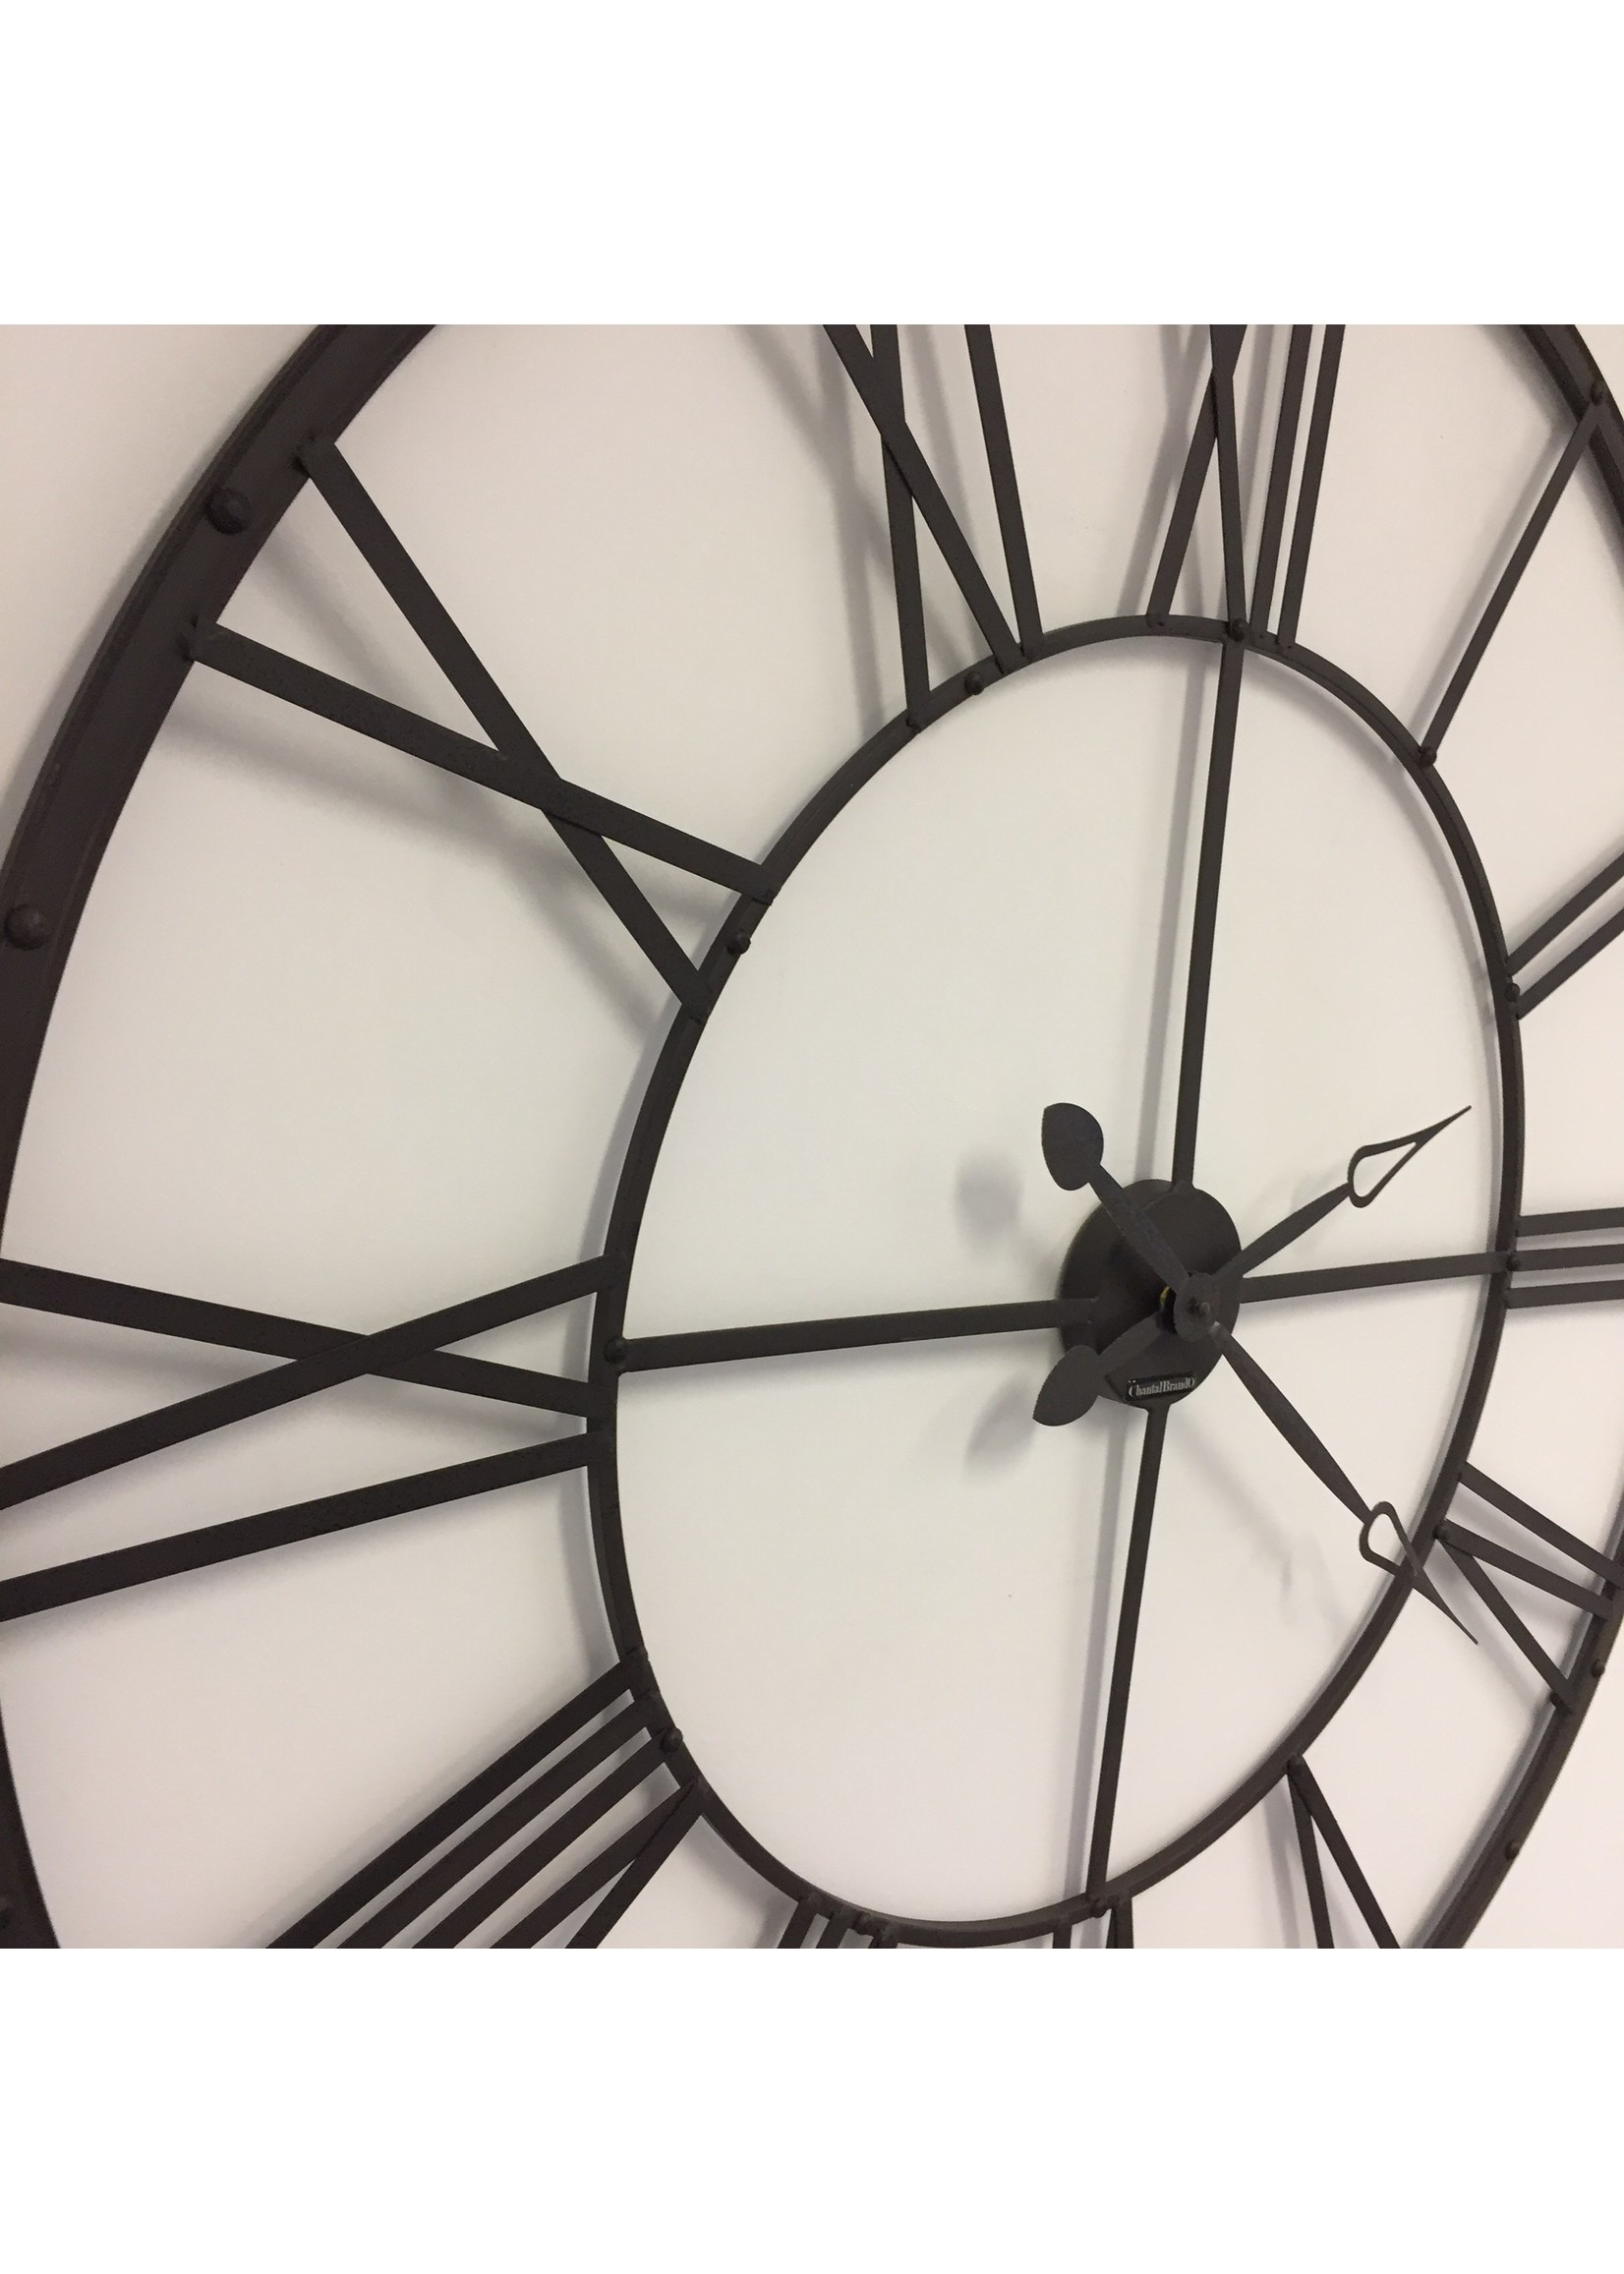 Klokkendiscounter Wandklok XXL Romeins wiel bruin vintage design